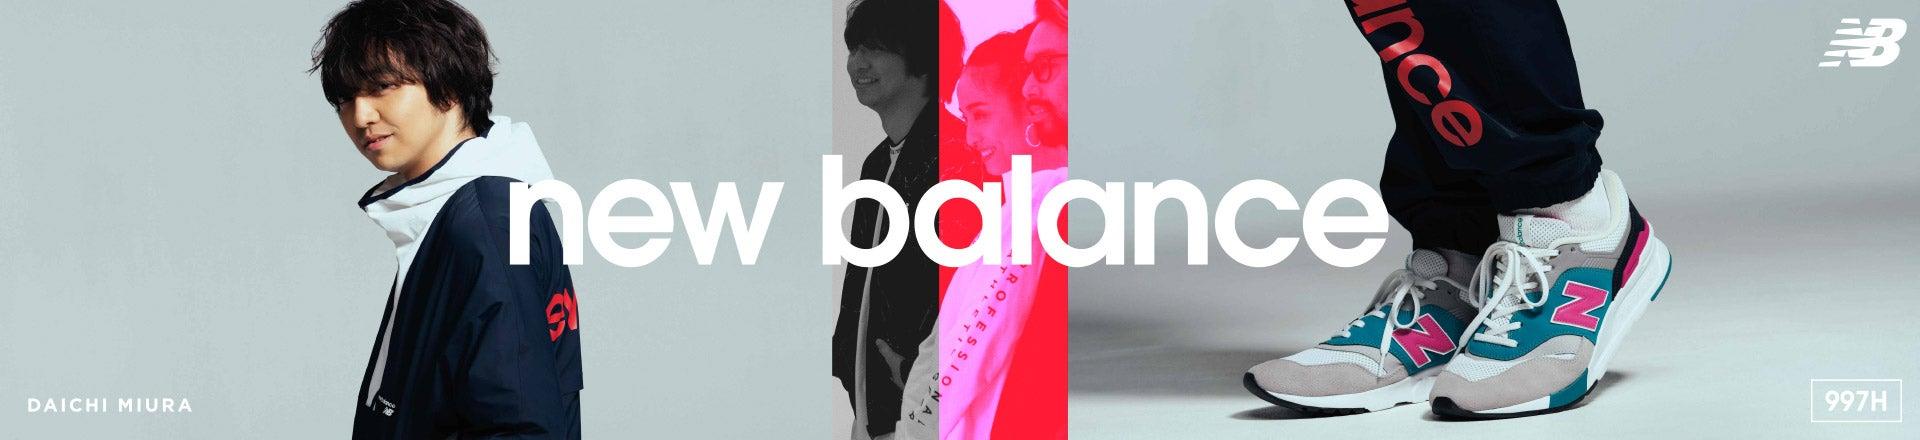 NB公式】ニューバランス | New Balance【公式通販】